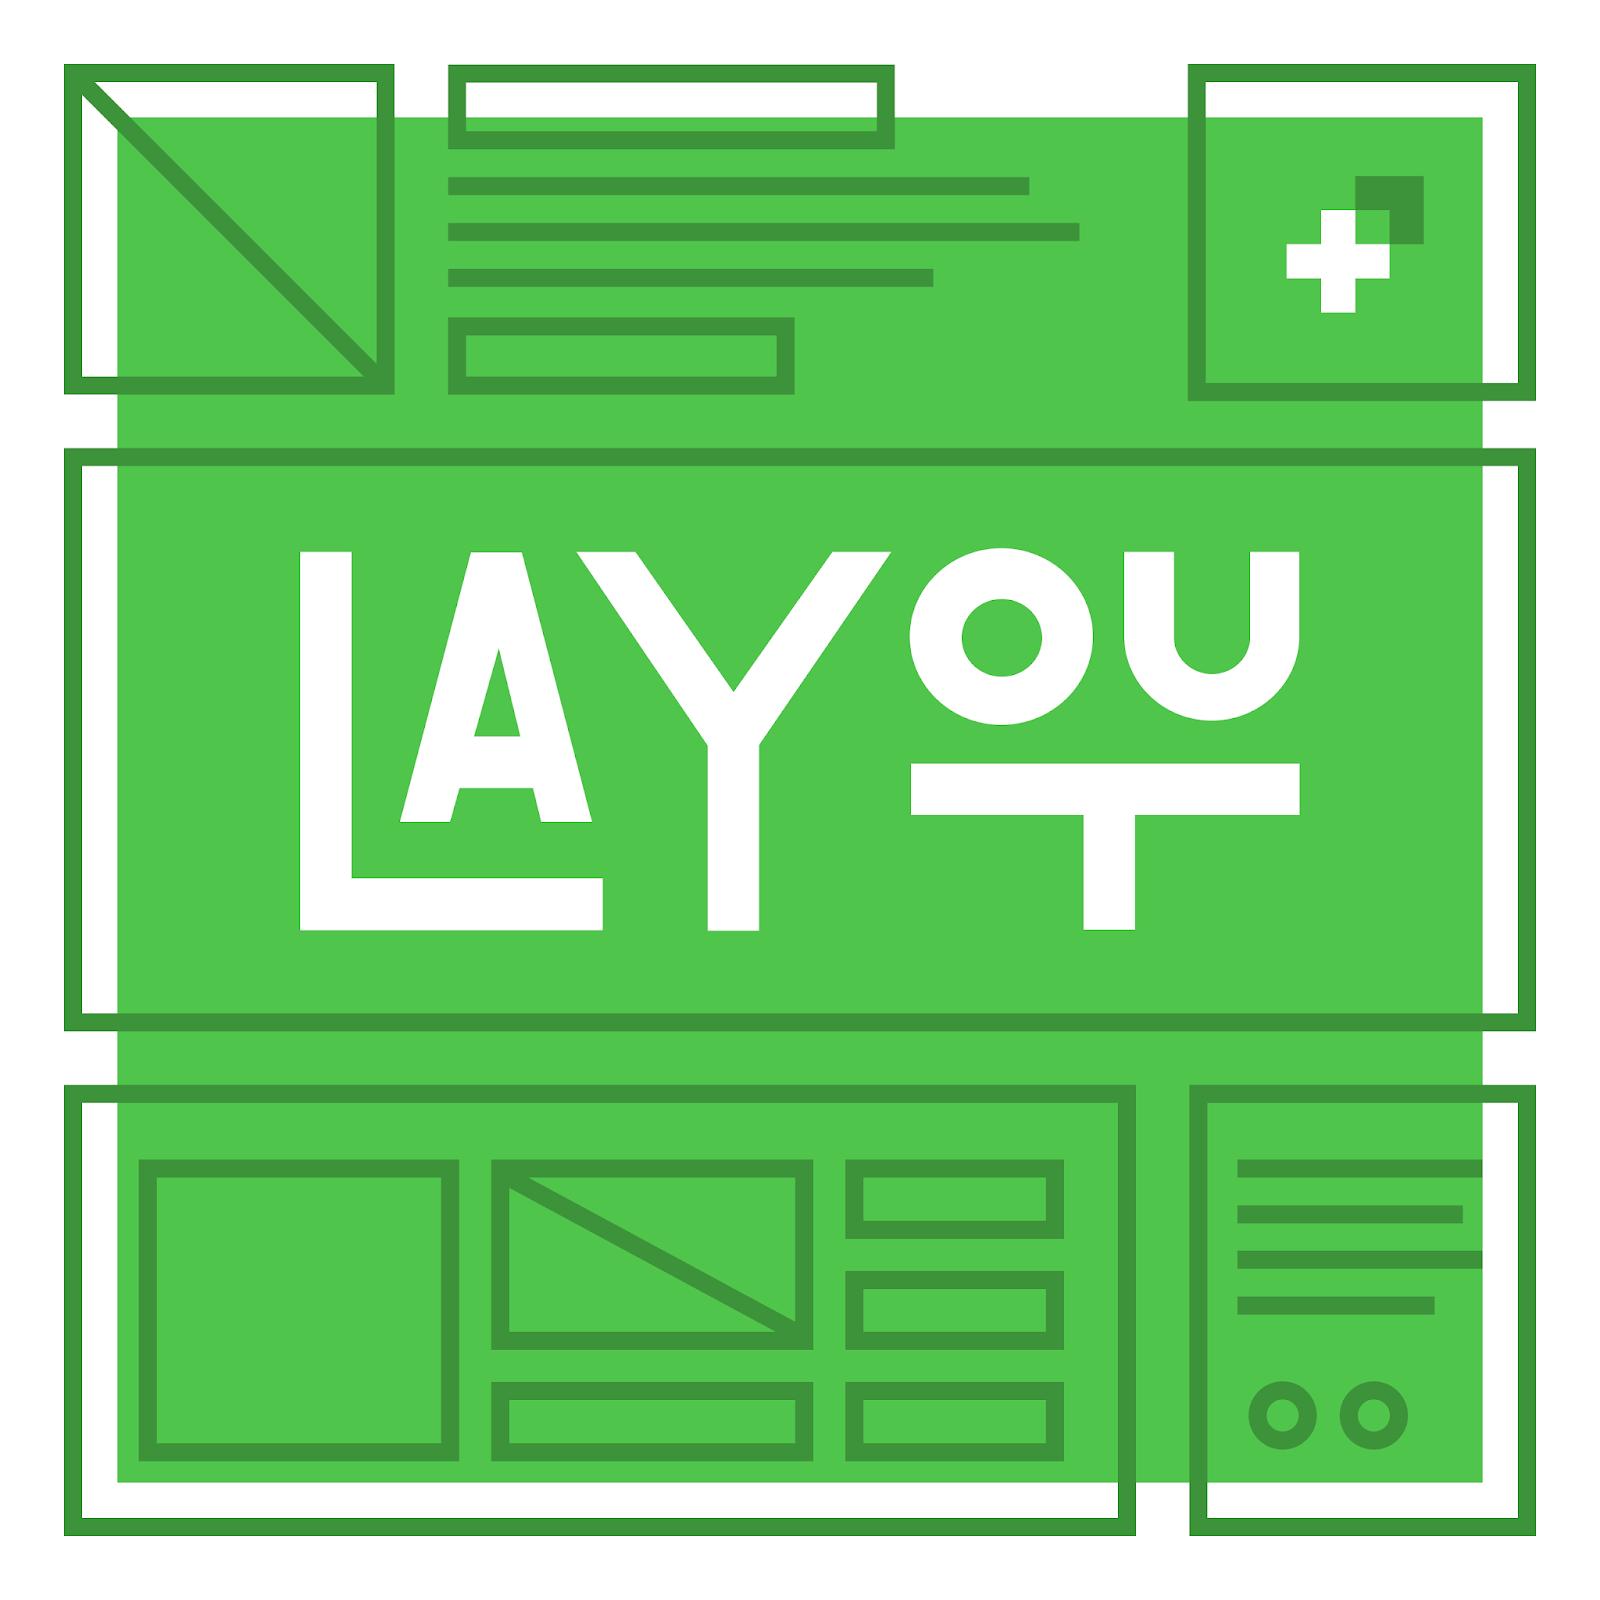 thiết kế website đẹp layout